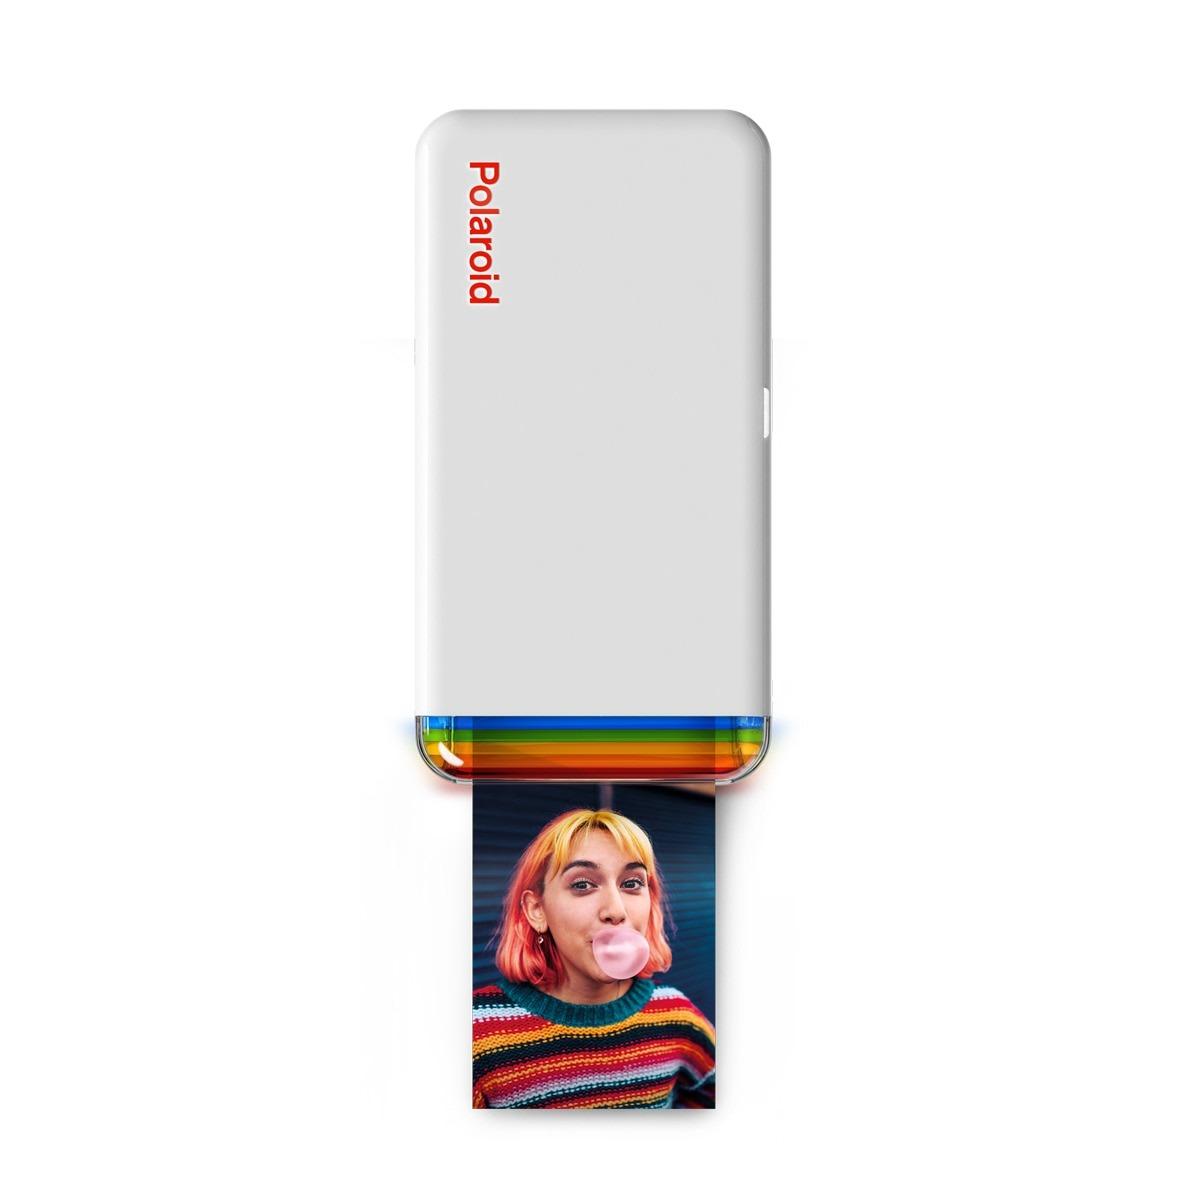 Impresora fotográfica Polaroid HiPrint Bluetooth